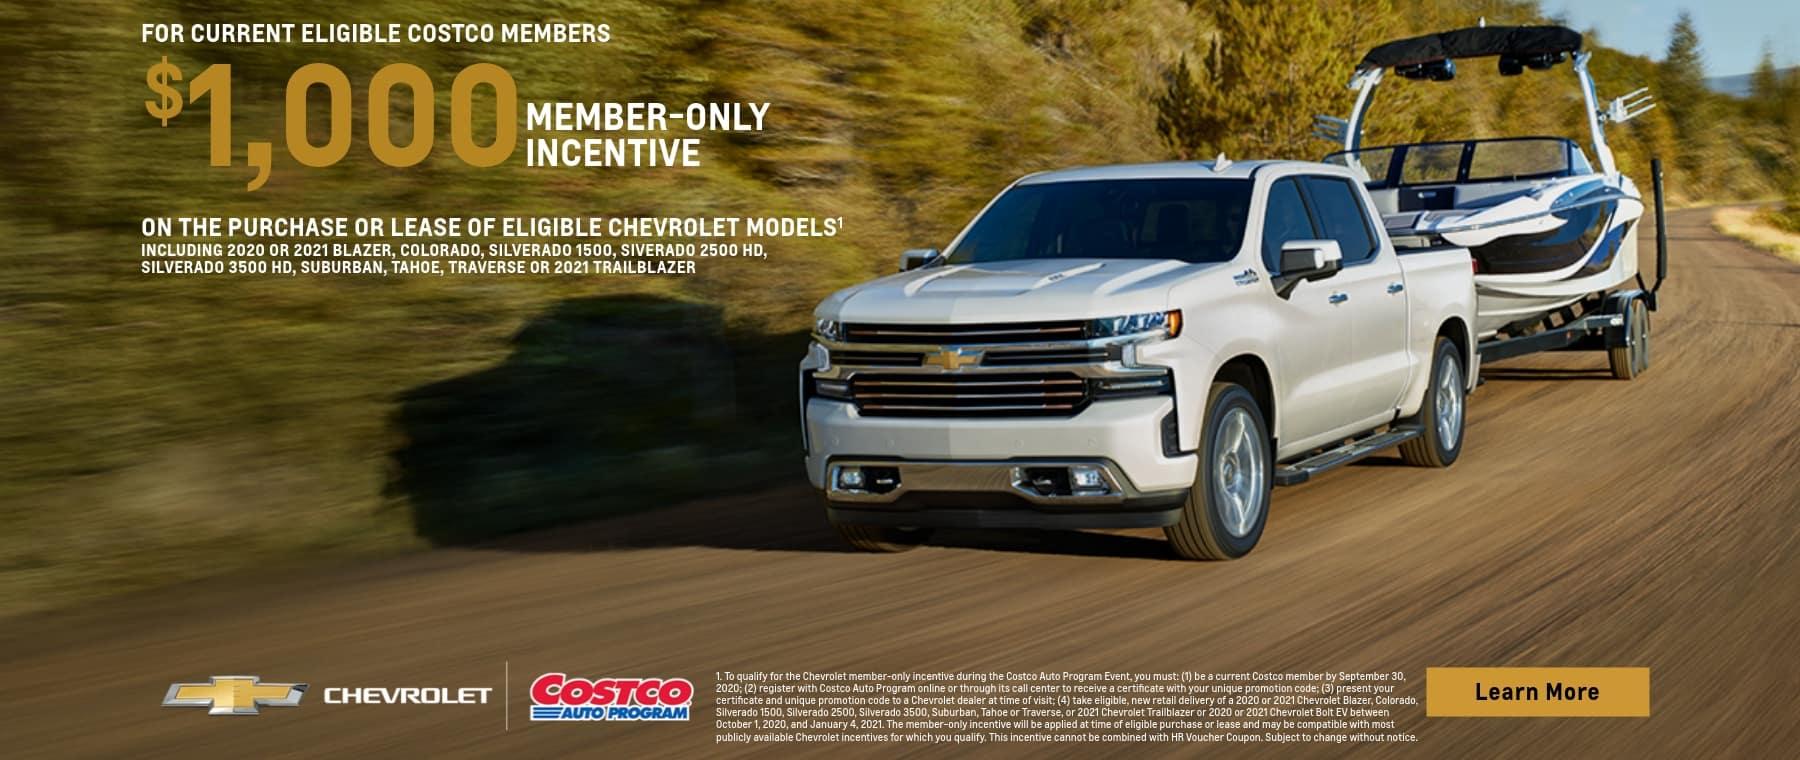 $1,000 Member Only Offer on Select Chevrolet Models